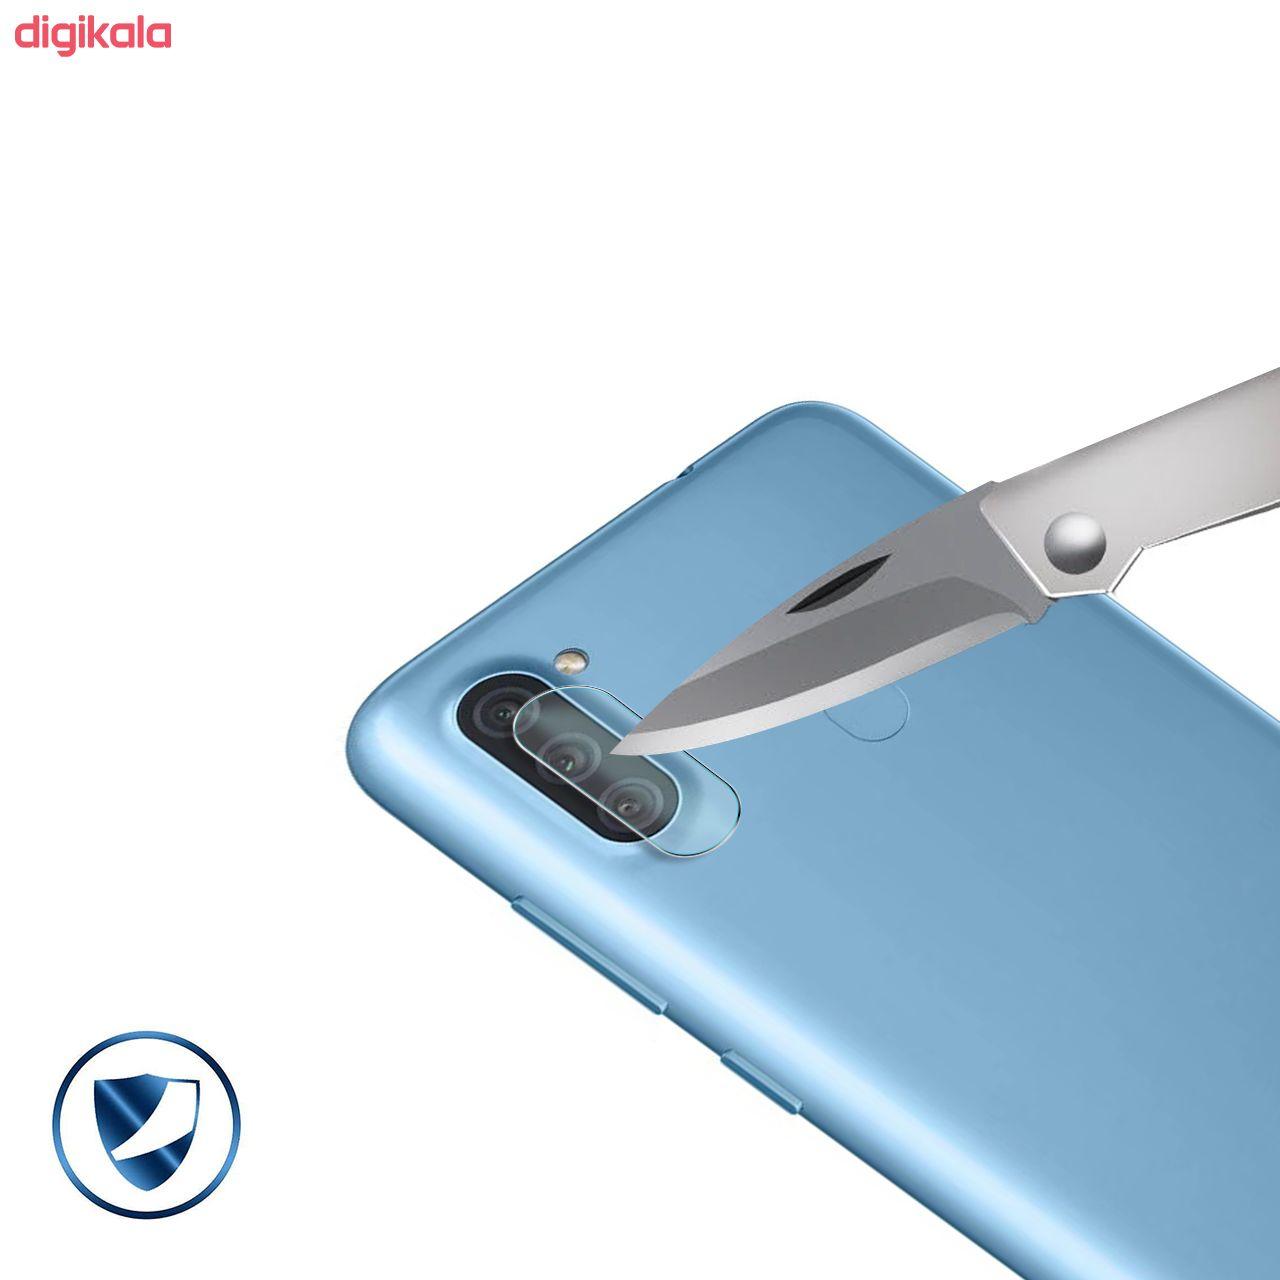 محافظ لنز دوربین سیحان مدل GLP مناسب برای گوشی موبایل سامسونگ Galaxy A11 main 1 2